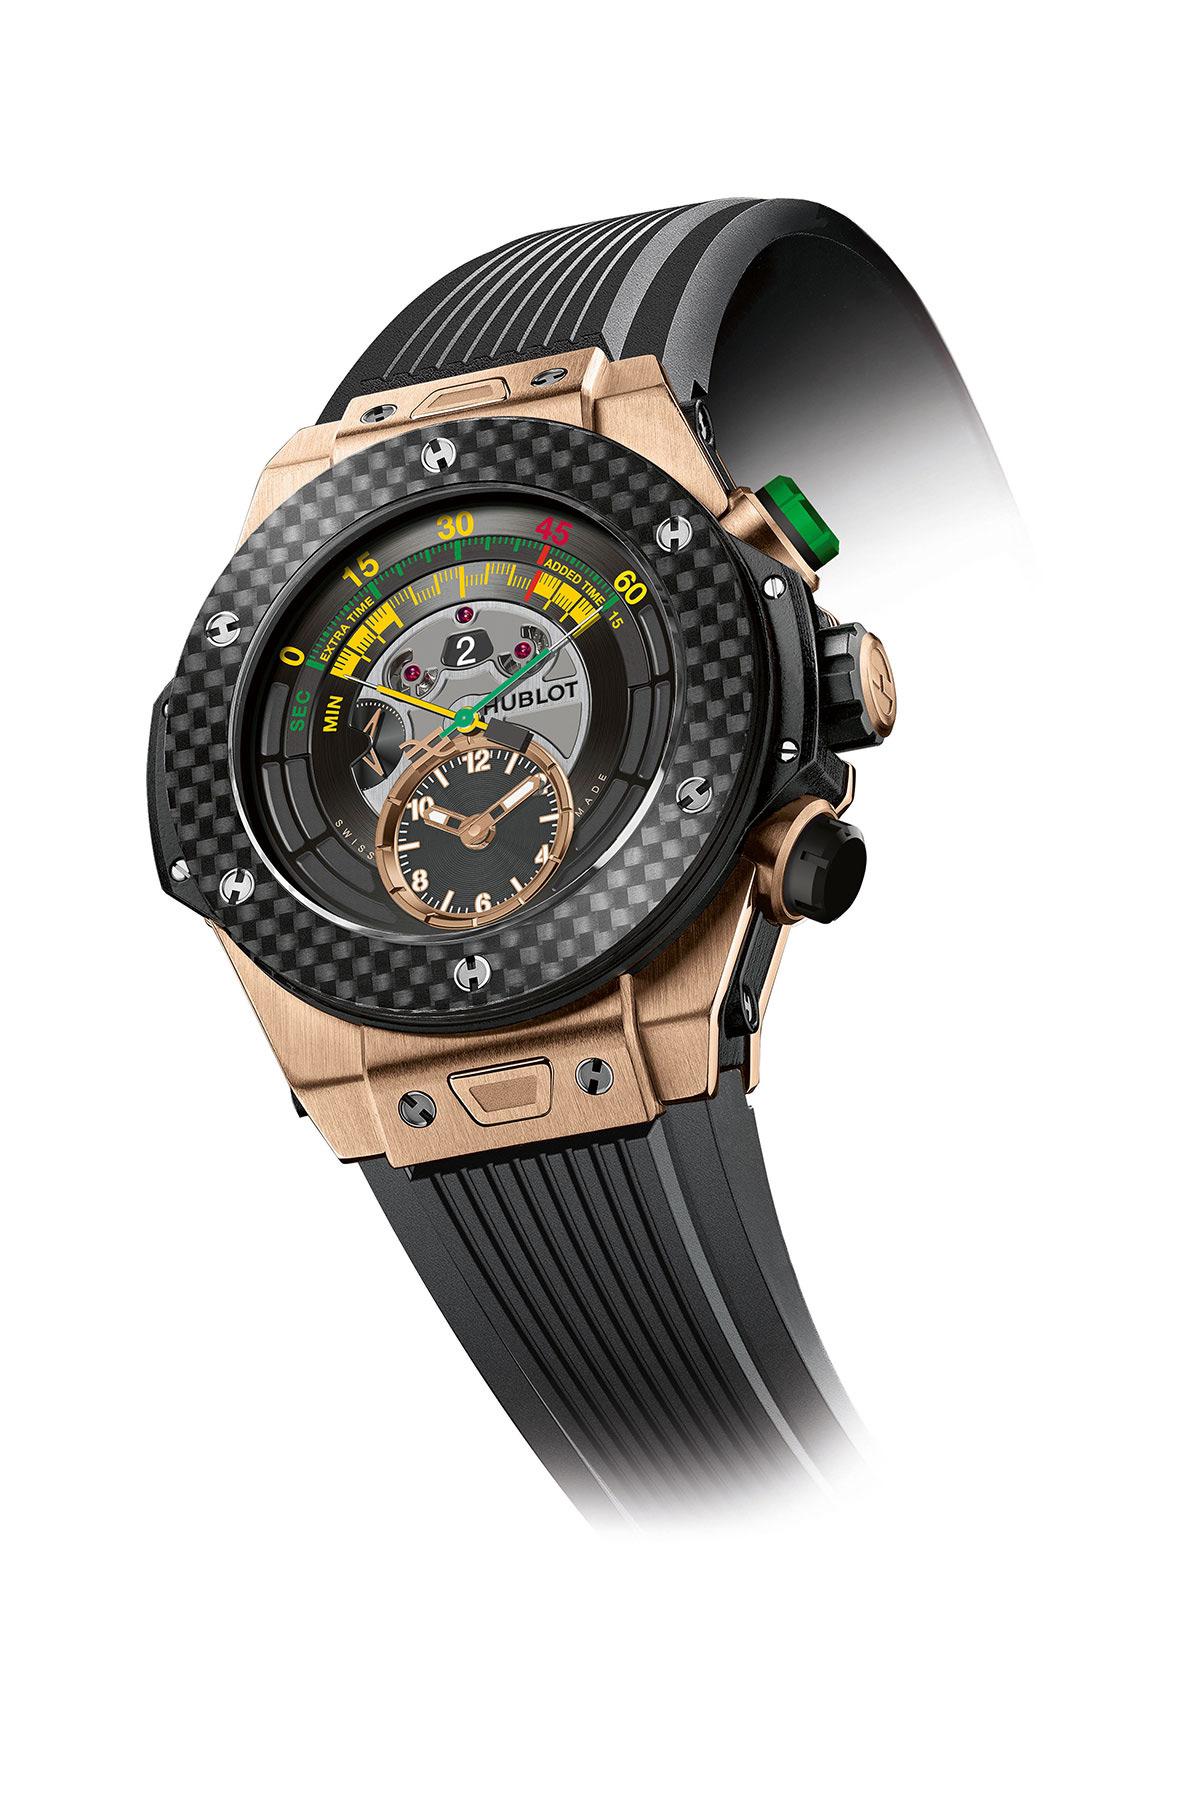 Hublot Big Bang Unico Bi-Retrograde Chrono - Official Watch of the 2014 FIFA World Cup